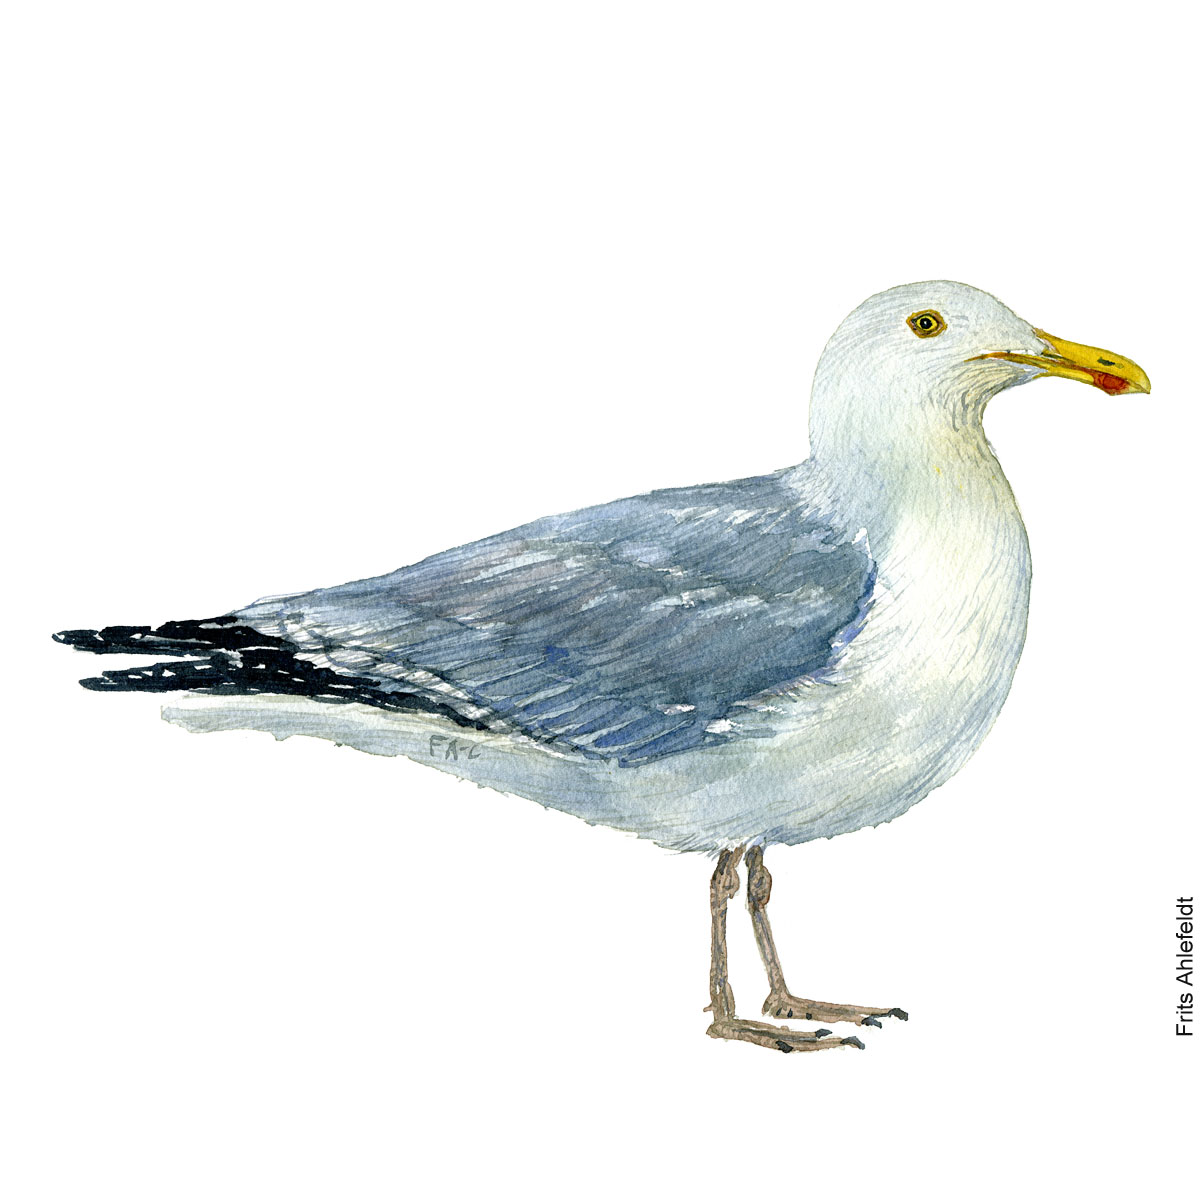 European herring gull. Bird watercolor illustration handmade by Frits Ahlefeldt